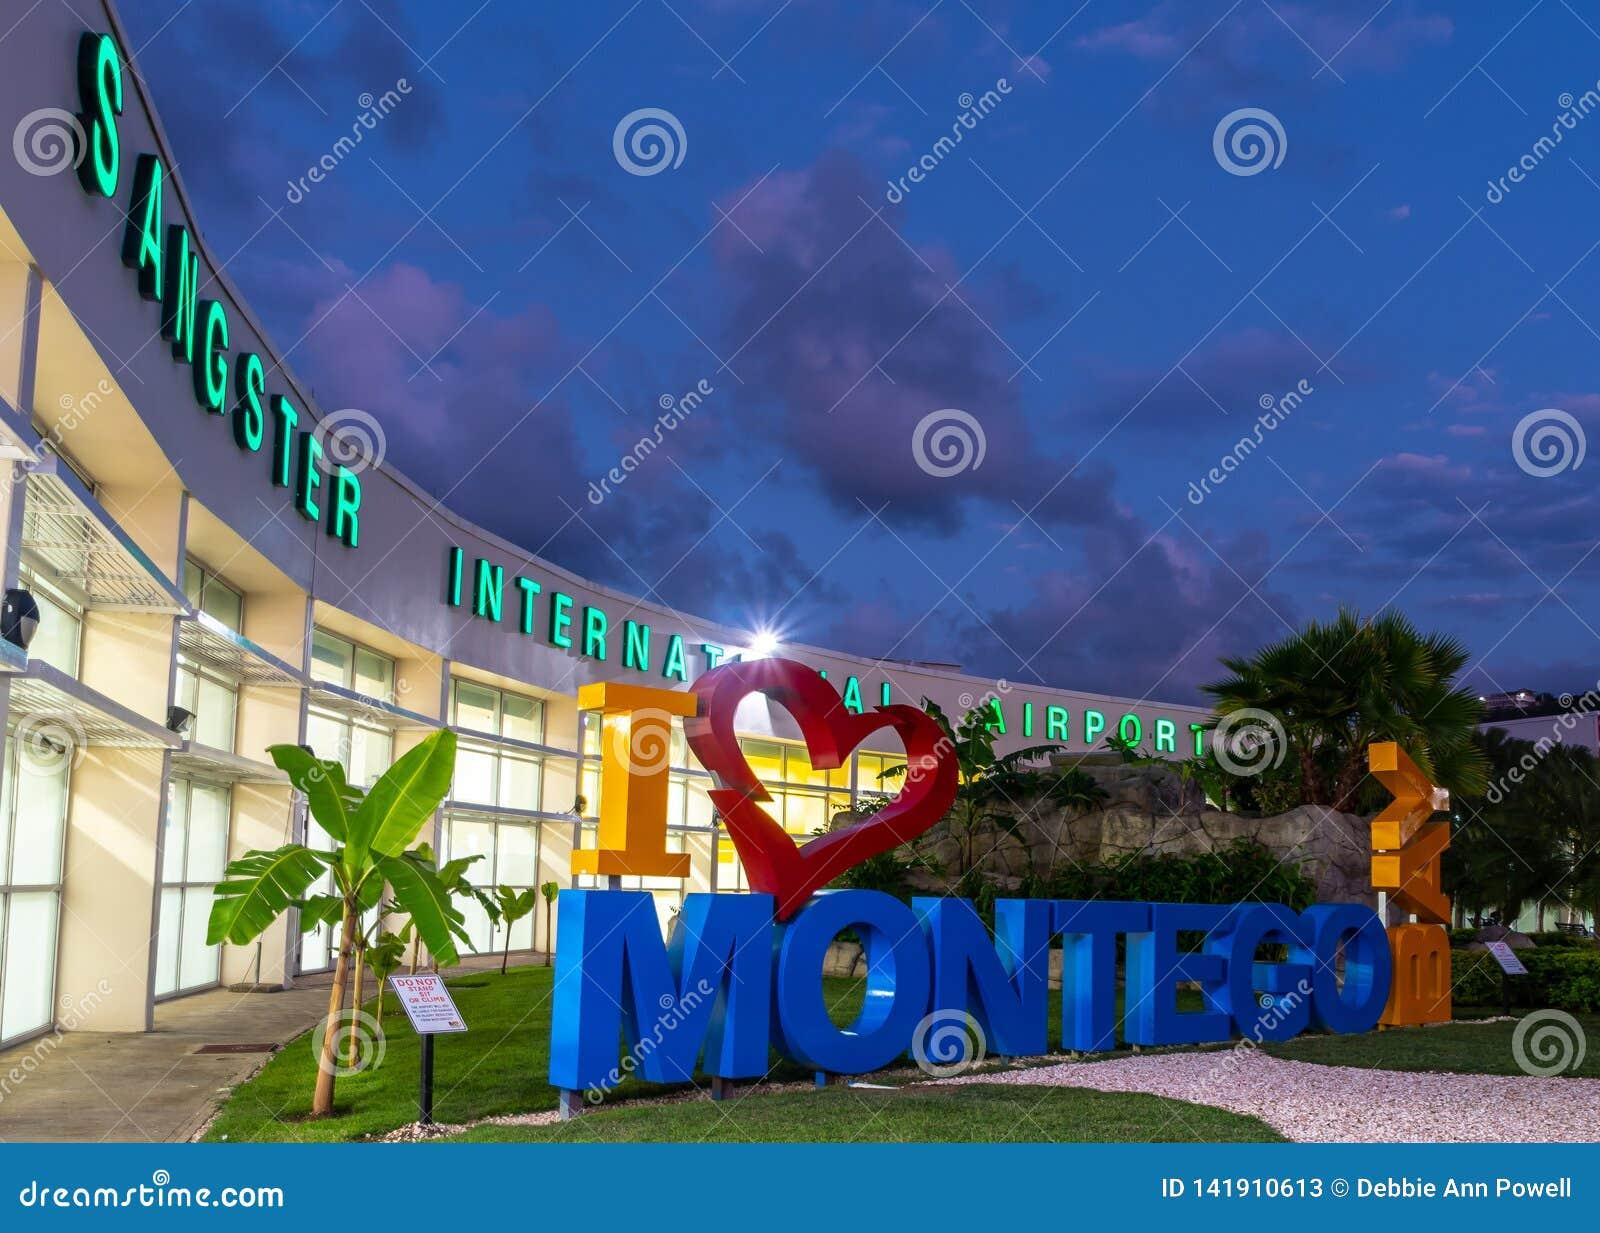 I love Montego Bay/ I heart Montego Bay sign at the Sangster International Airport